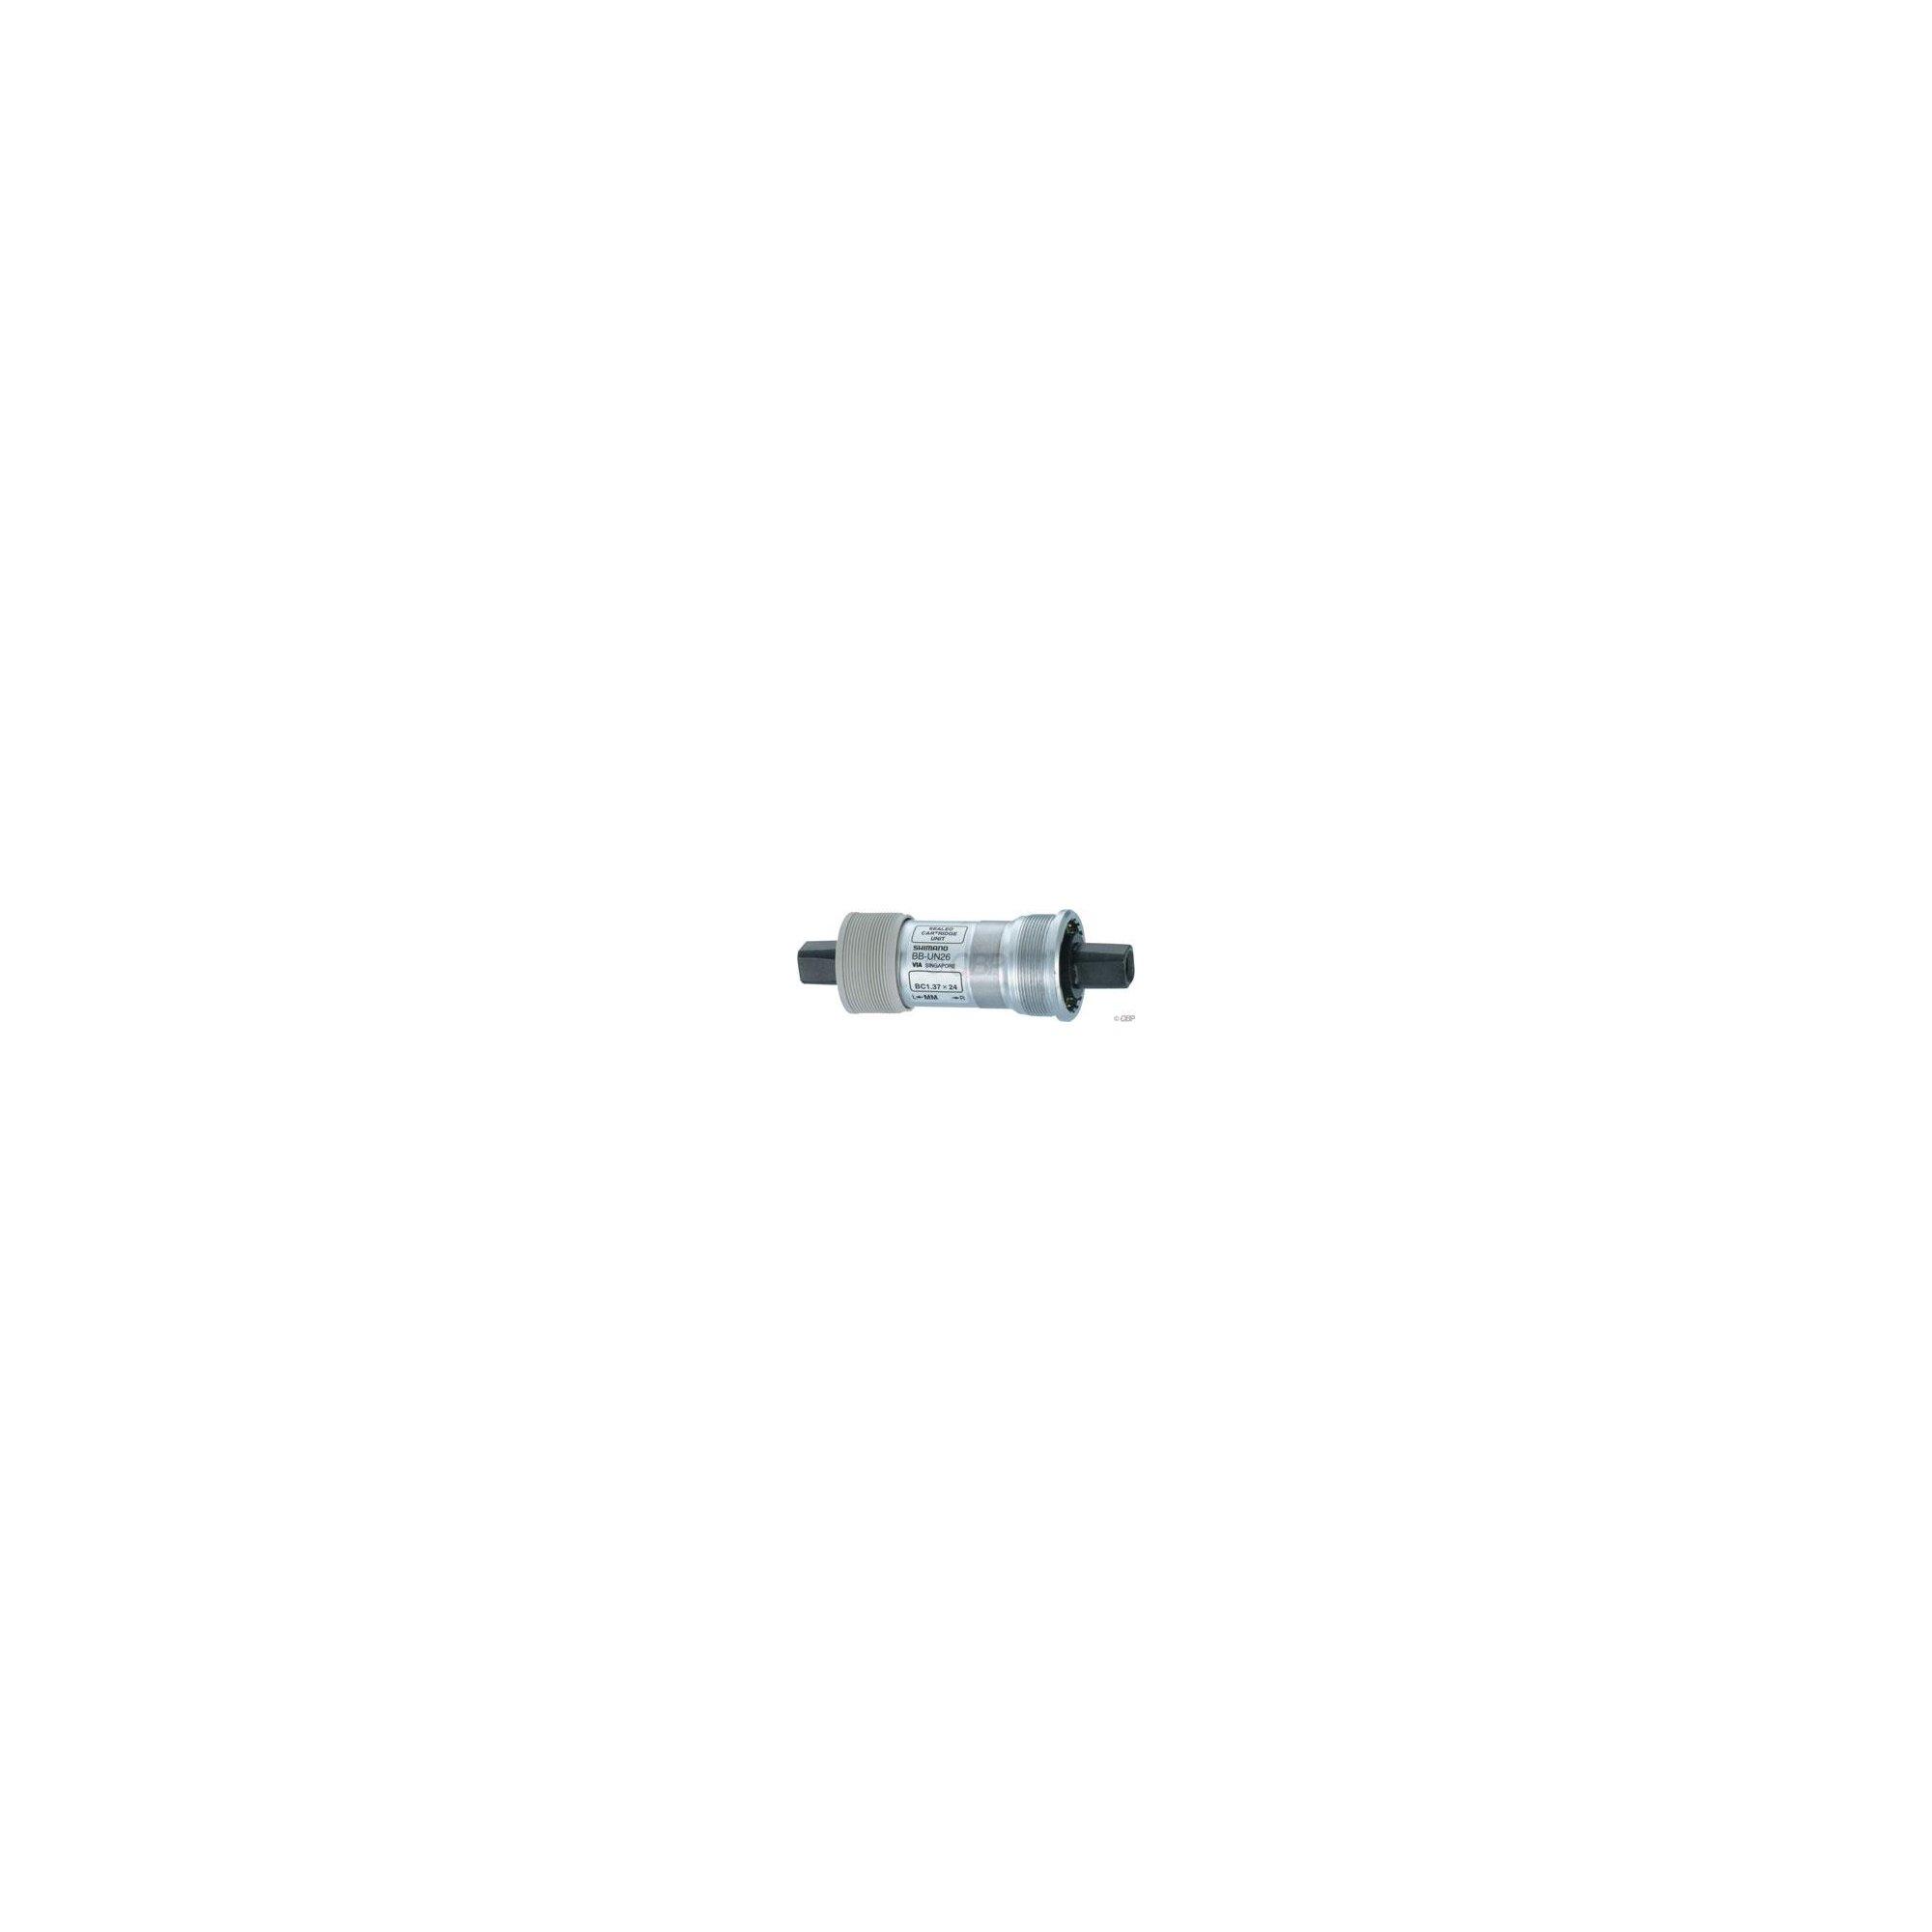 SHIMANO BB-UN26 Cartridge BB, JIS - 68x117.5mm